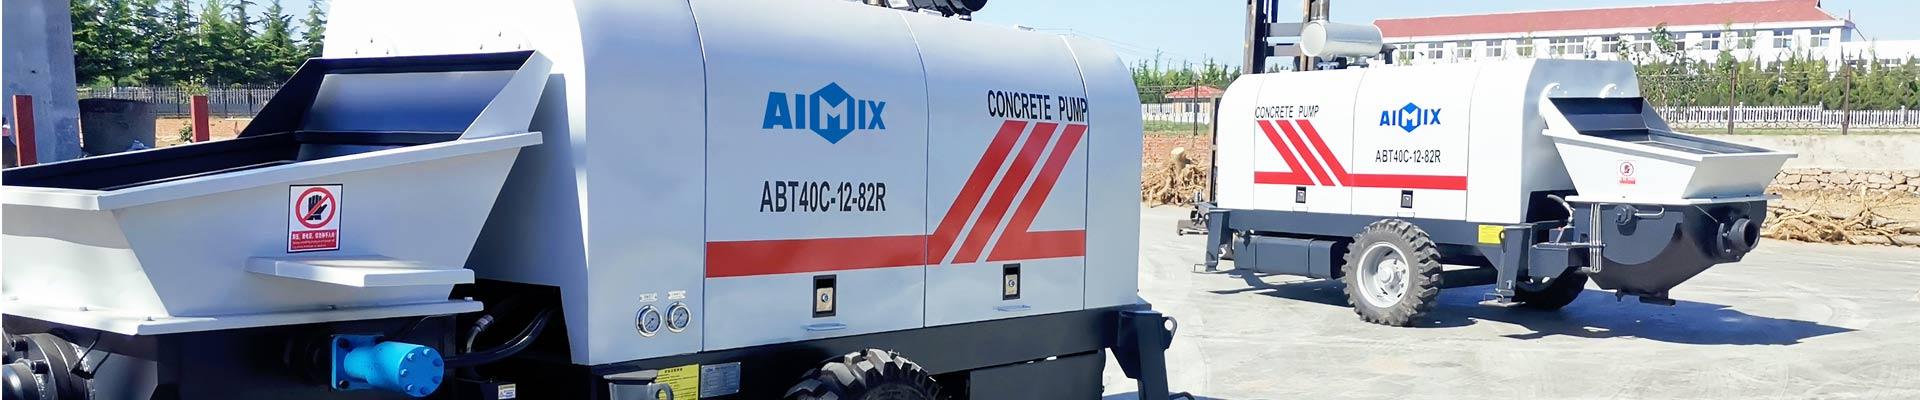 Bomba De Concreto Precio De AIMIX